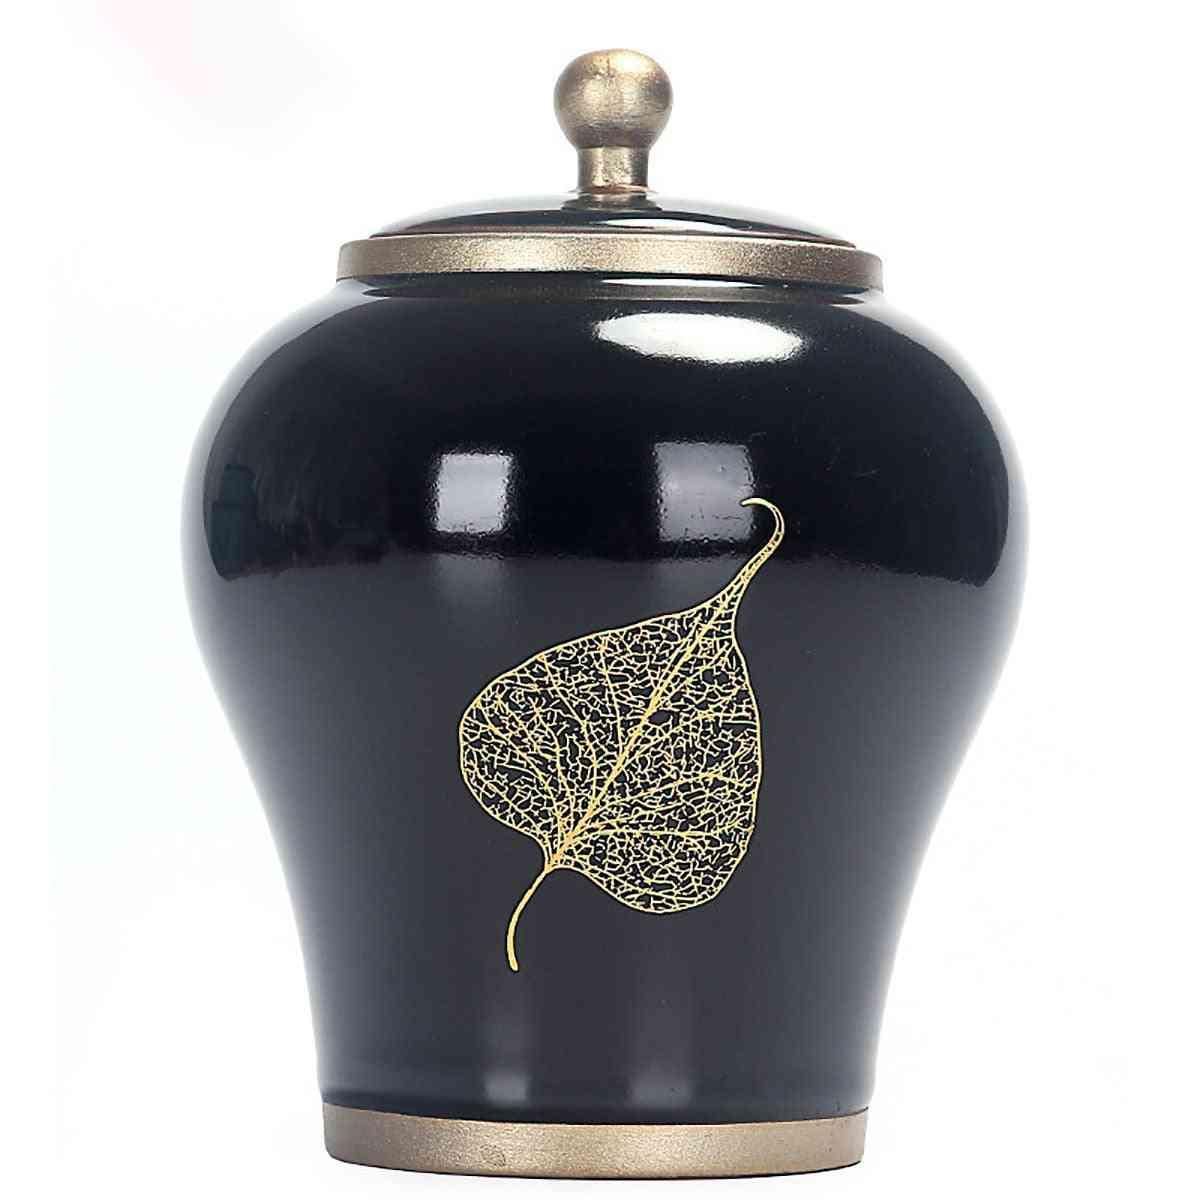 Pet Cremation Memorial Jar Ceramic Gradient Glaze For Dog Cat Bird Mouse Ashes Keepsake Storage Box